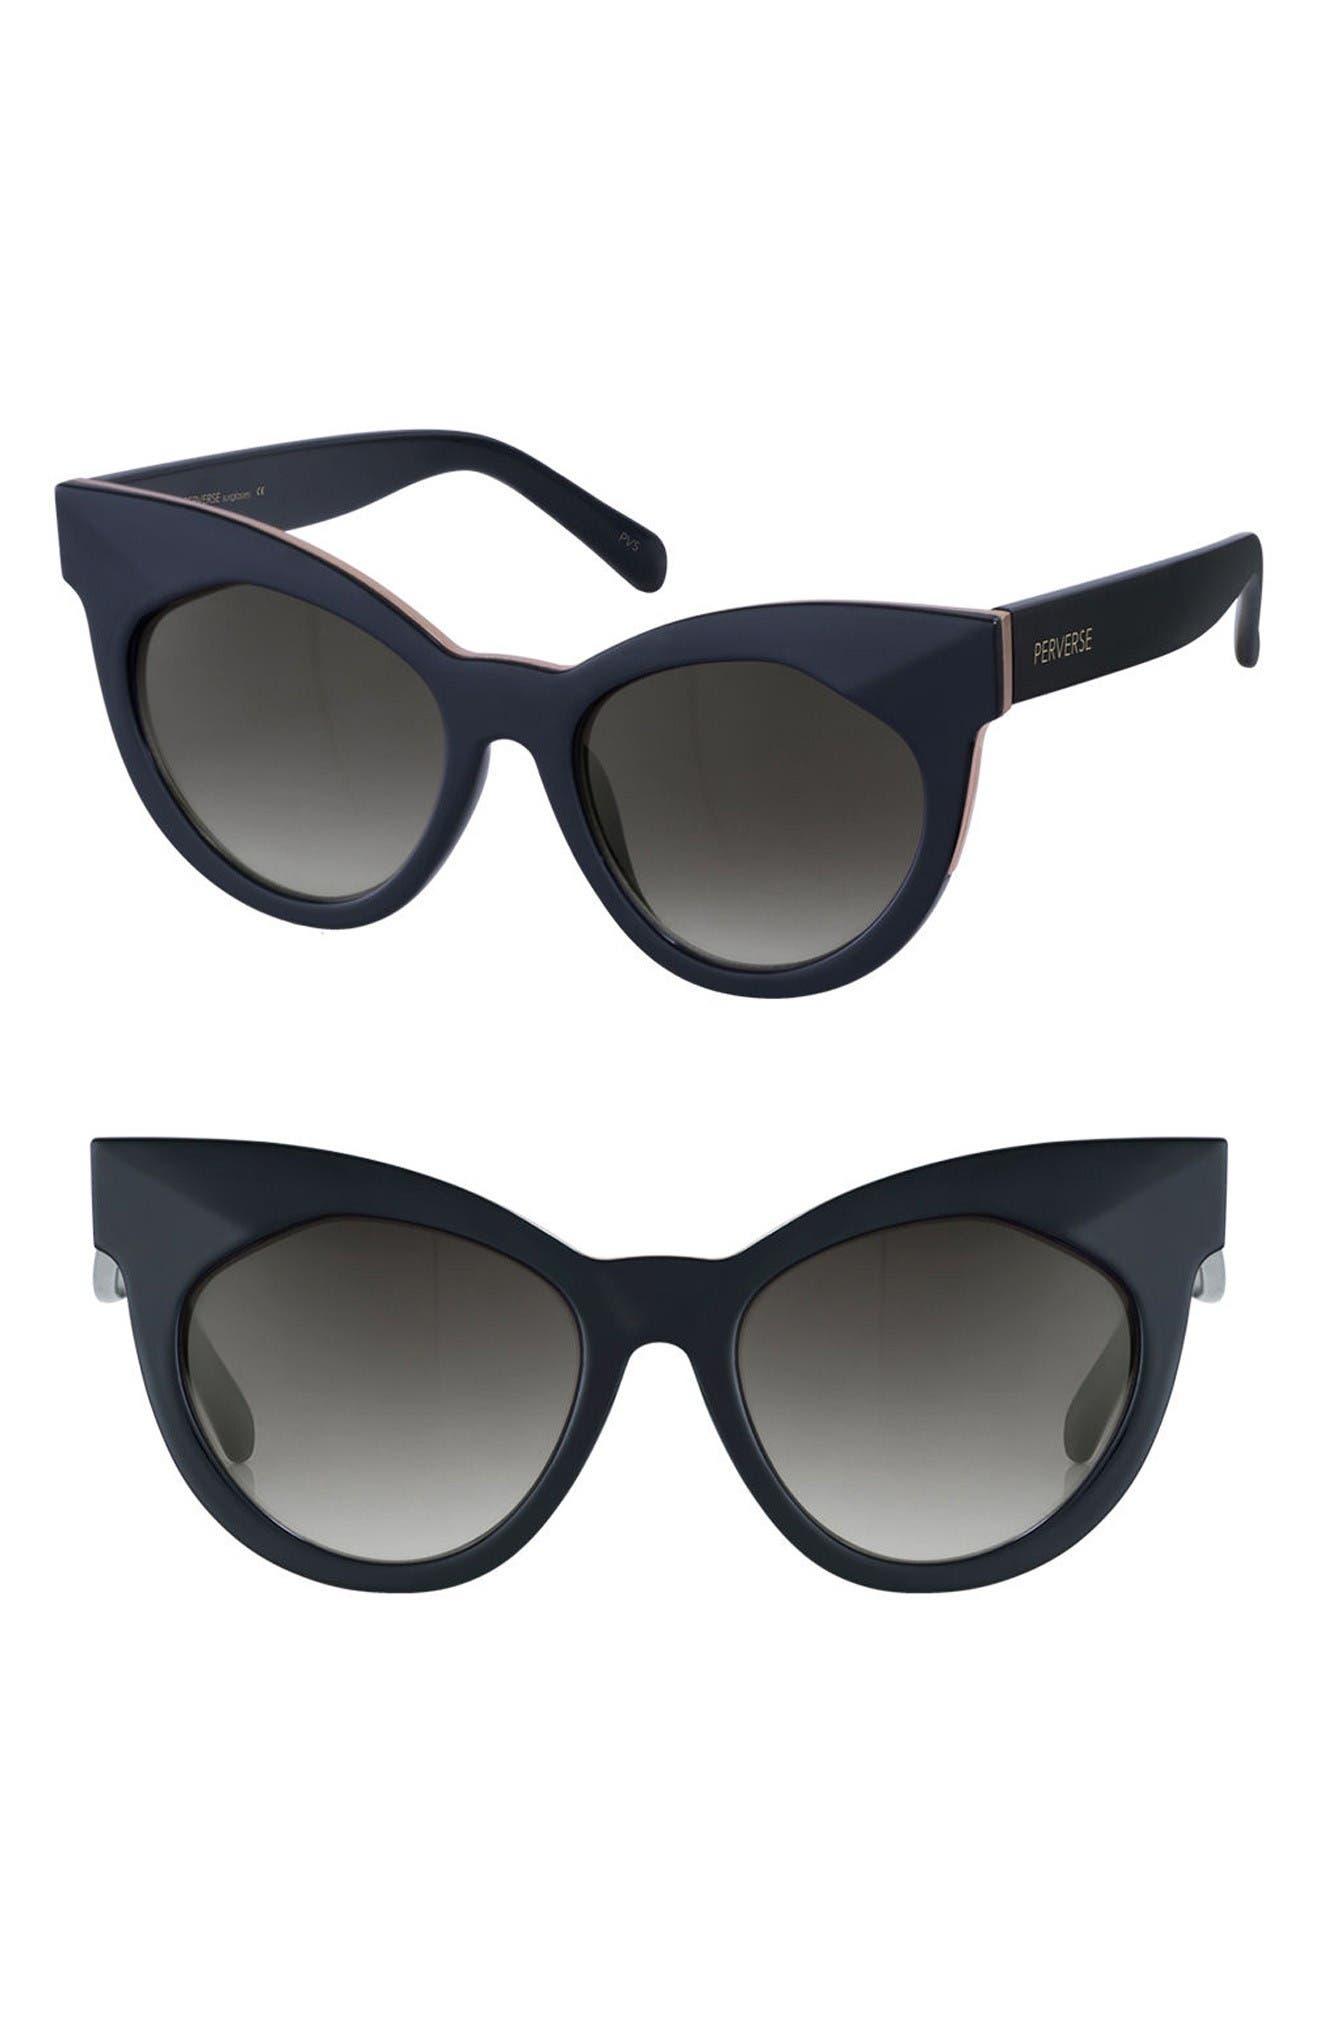 Main Image - PERVERSE Cosmopolitan 55mm Cat Eye Sunglasses